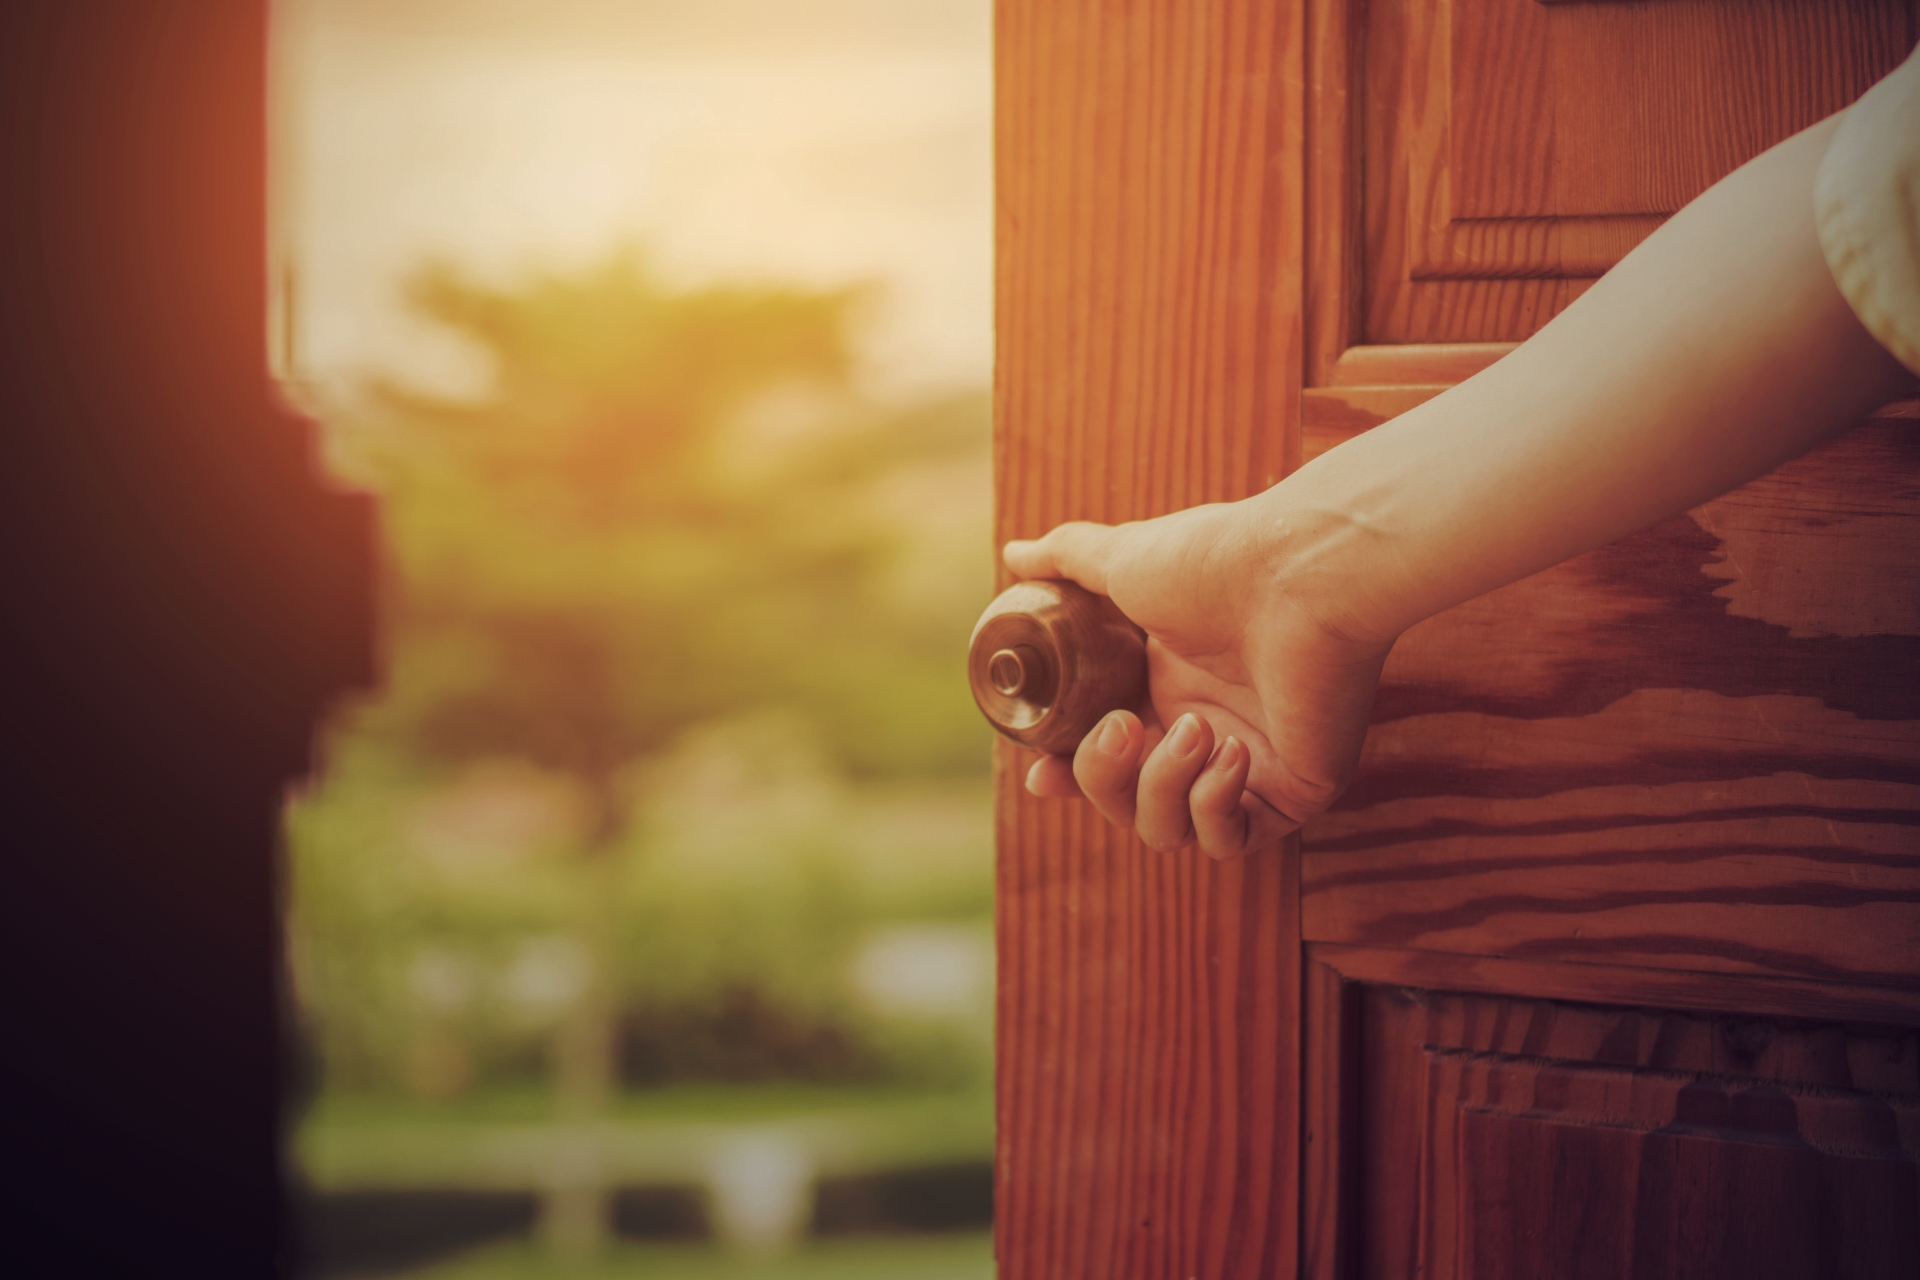 Matrimonial Property Amp Financial Settlements Agp Law